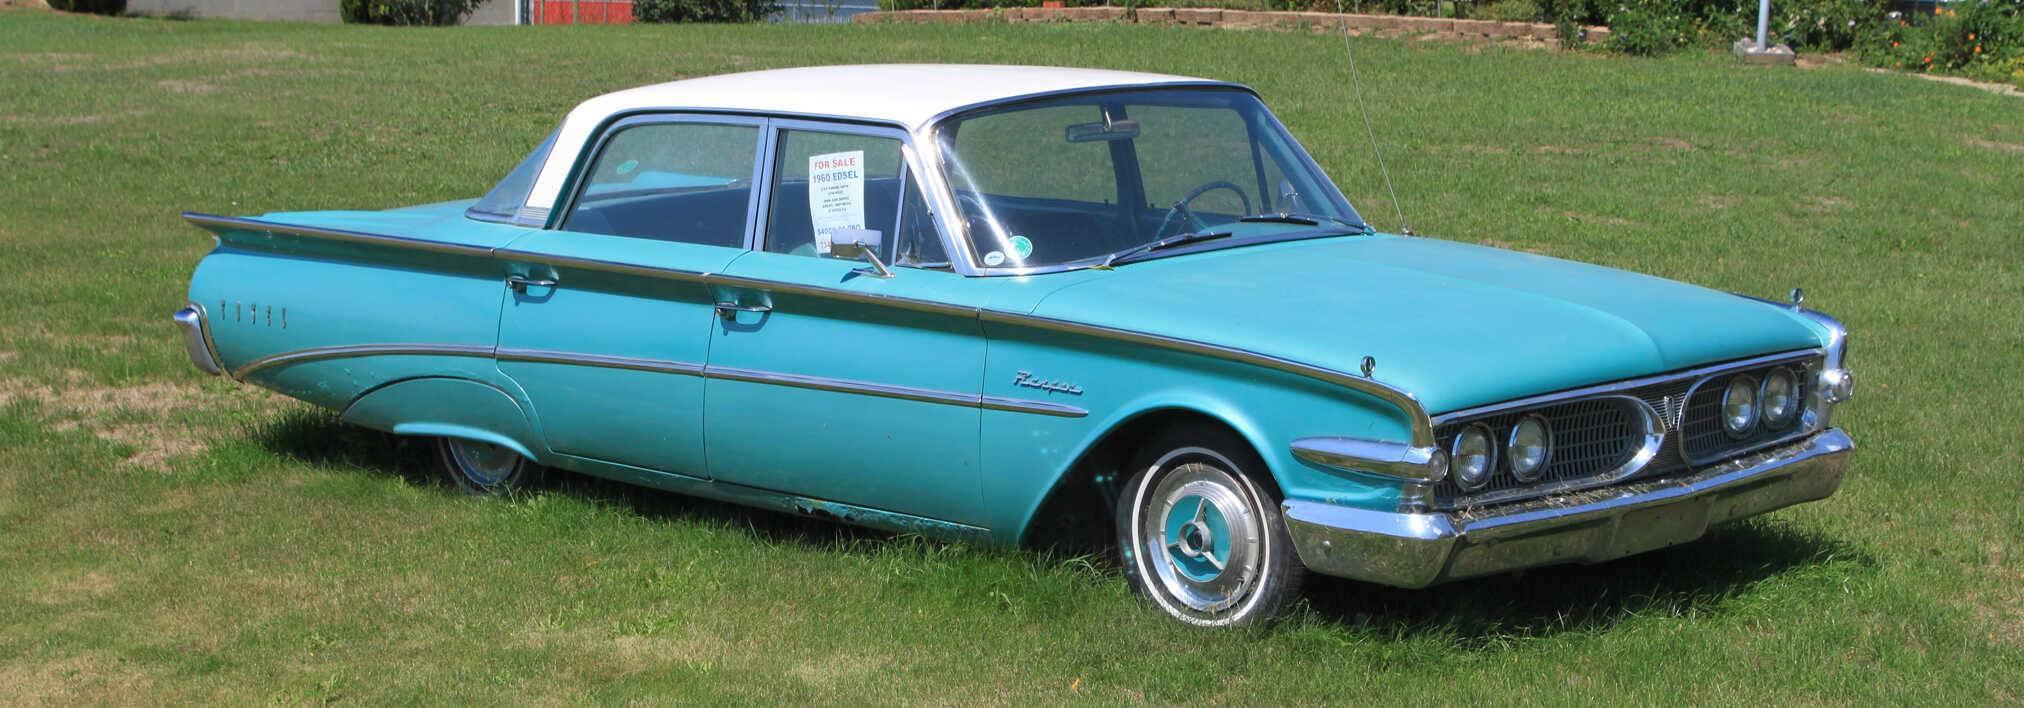 Ford's Edsel car